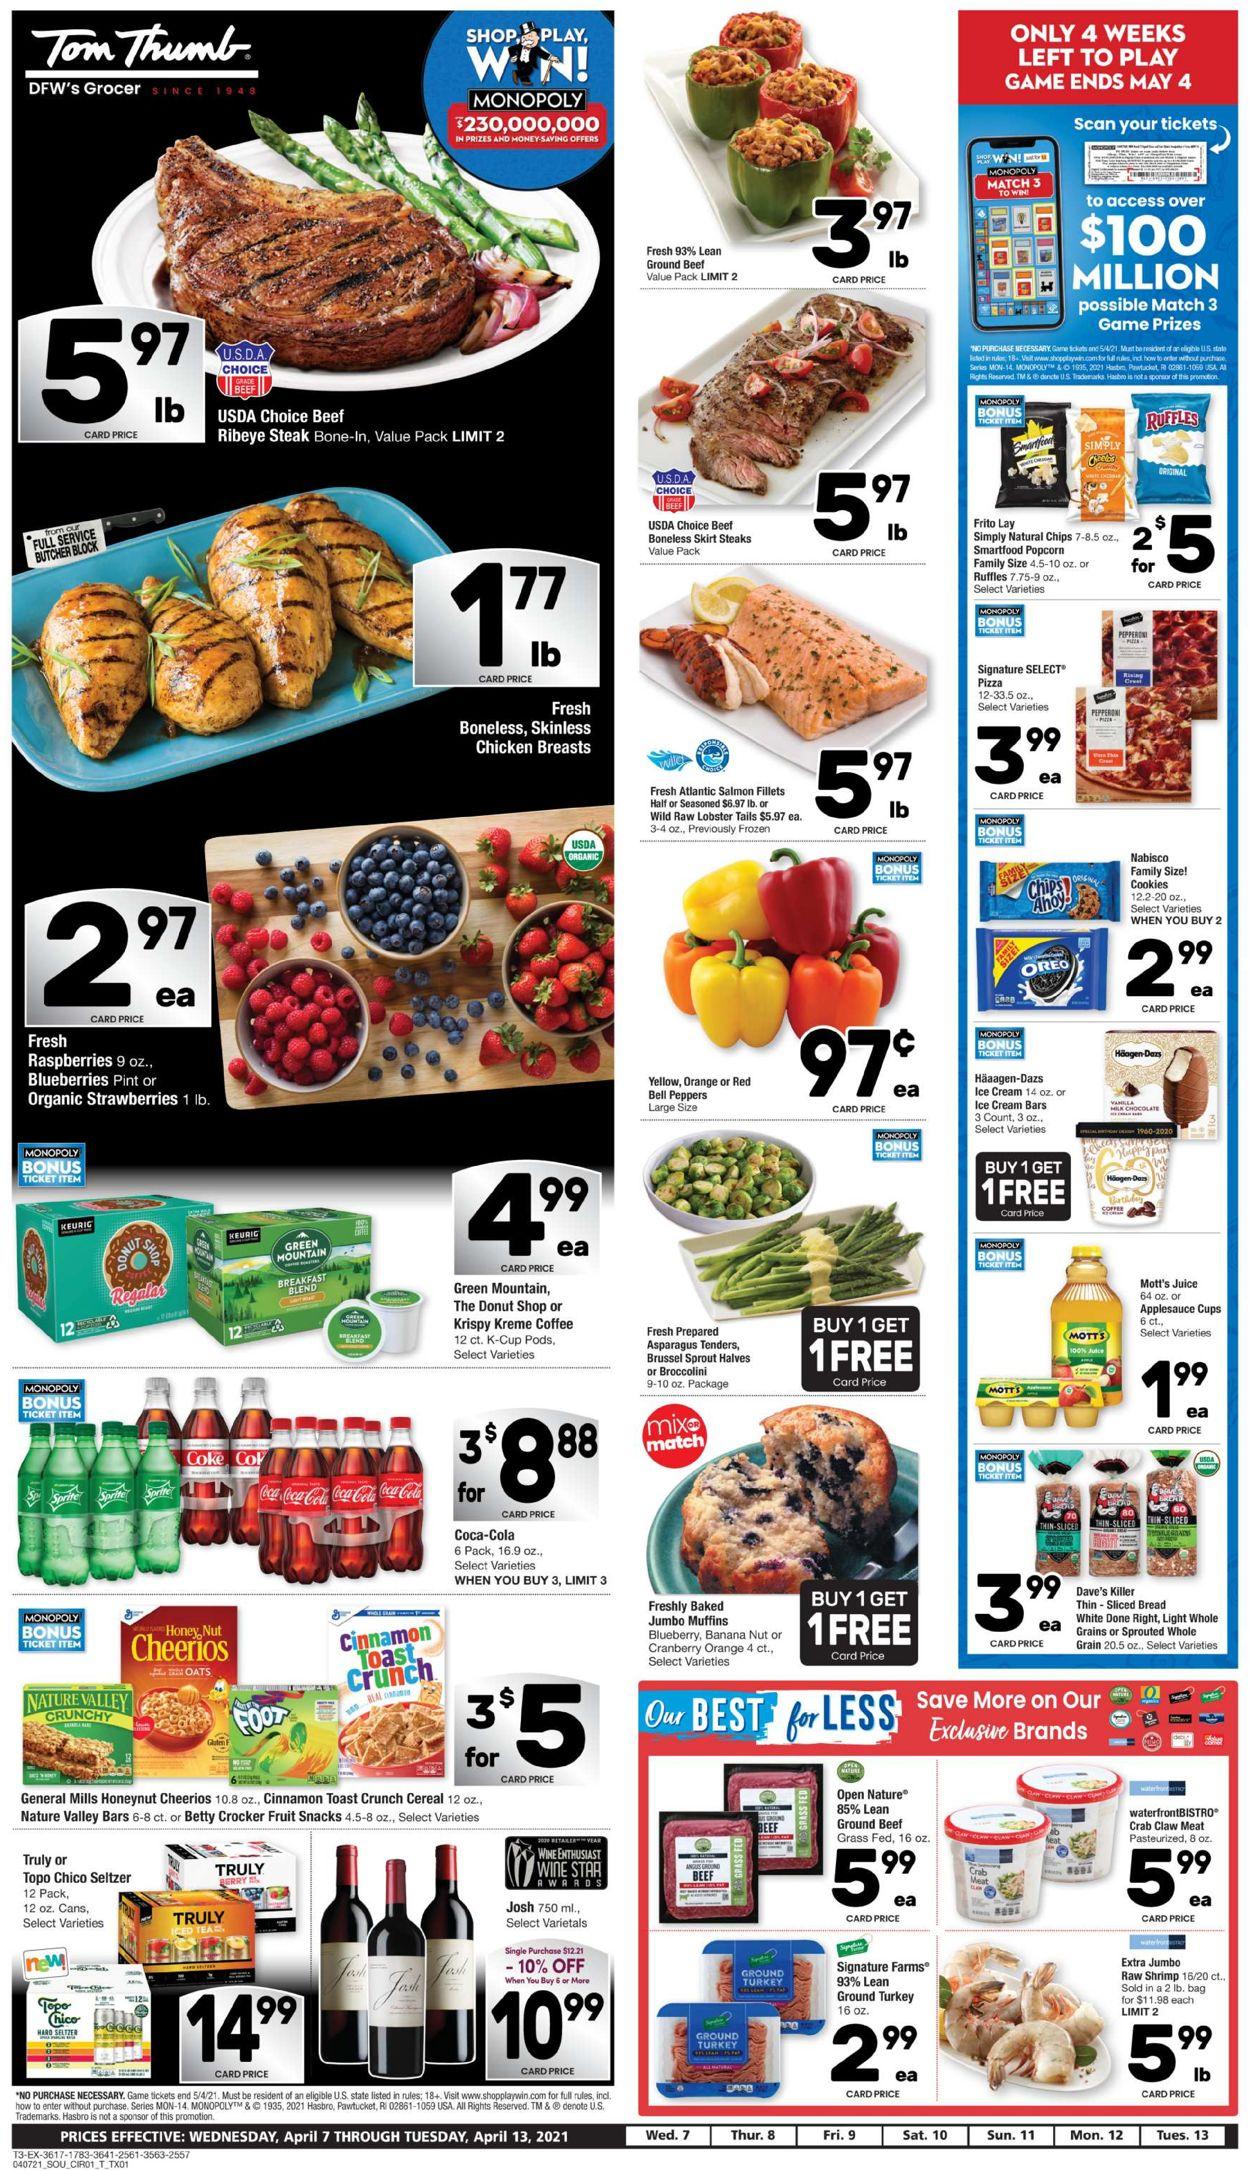 Tom Thumb Weekly Ad Circular - valid 04/07-04/13/2021